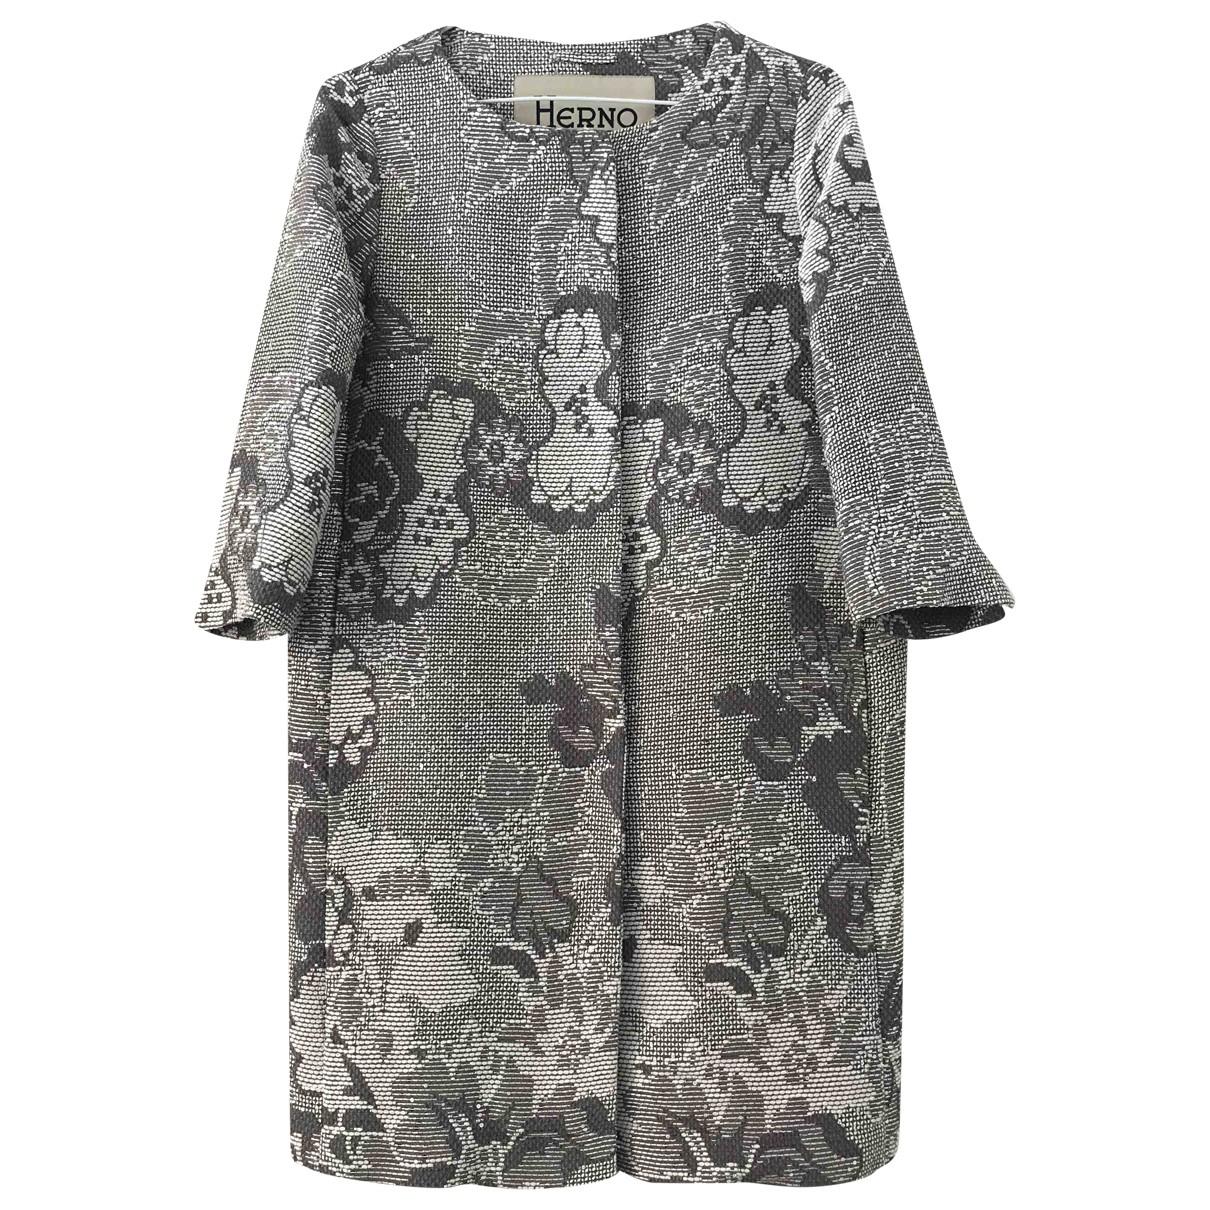 Herno \N Grey coat for Women S International